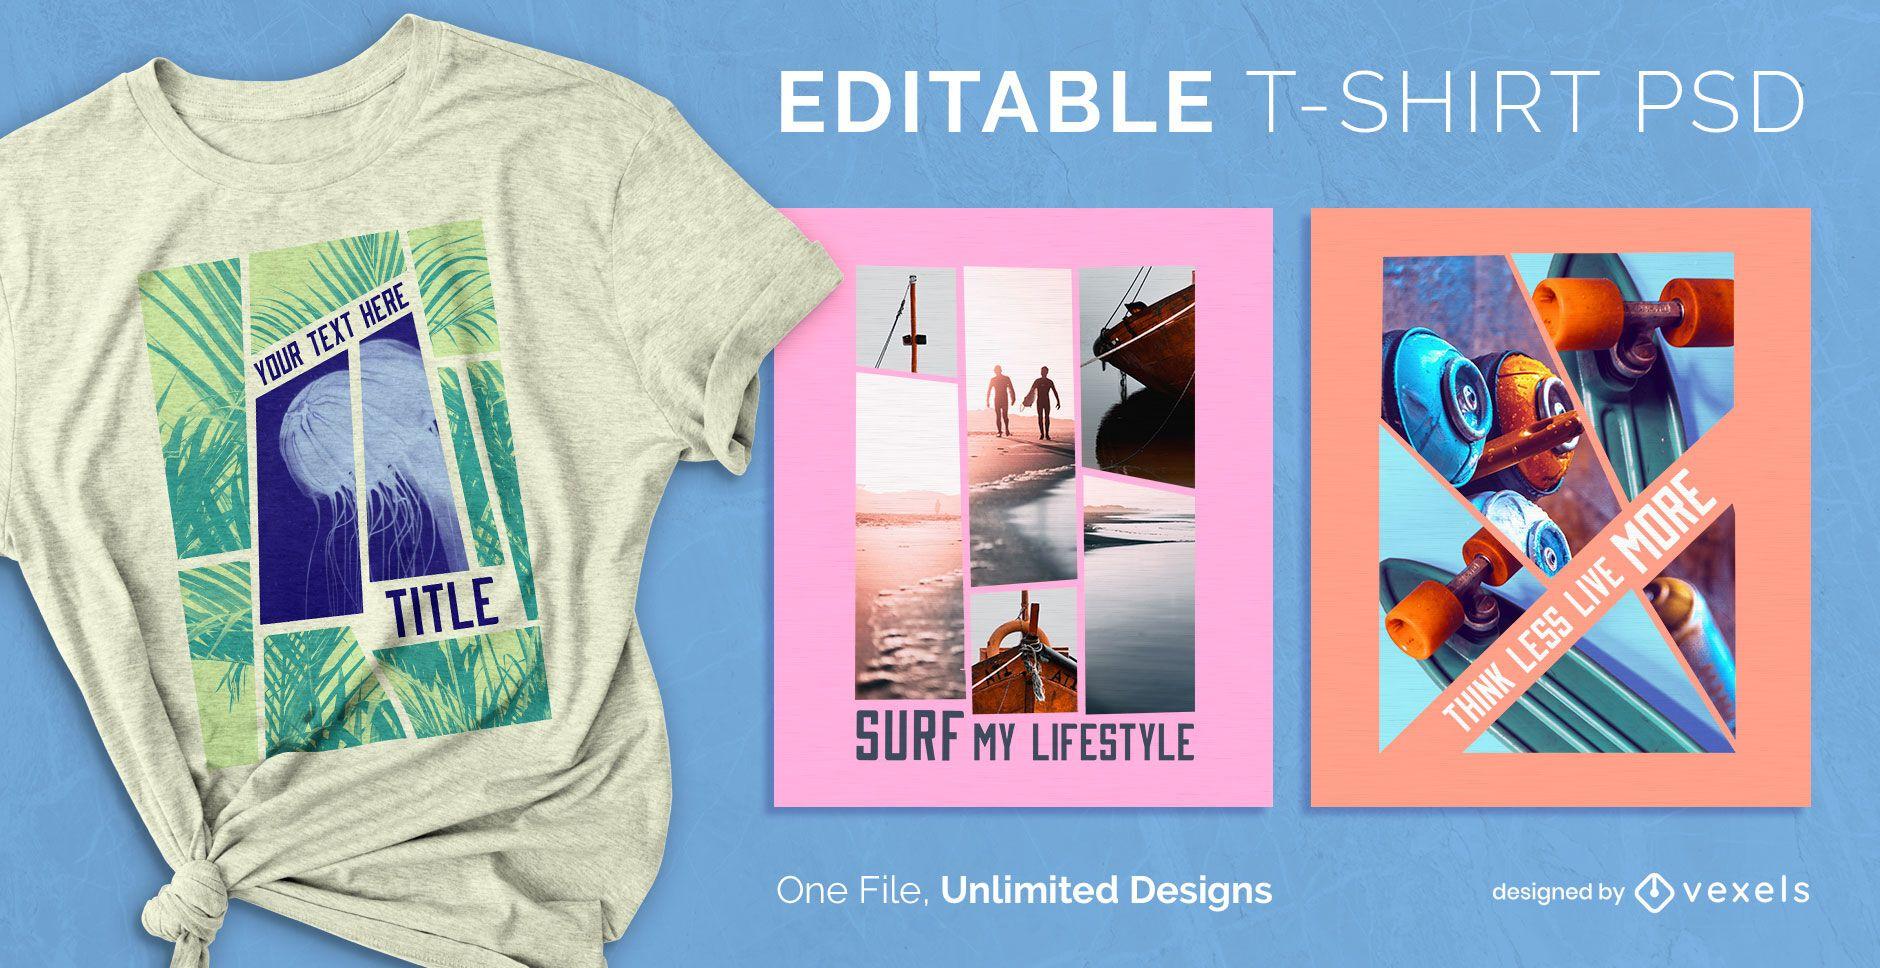 Collage skalierbares T-Shirt PSD